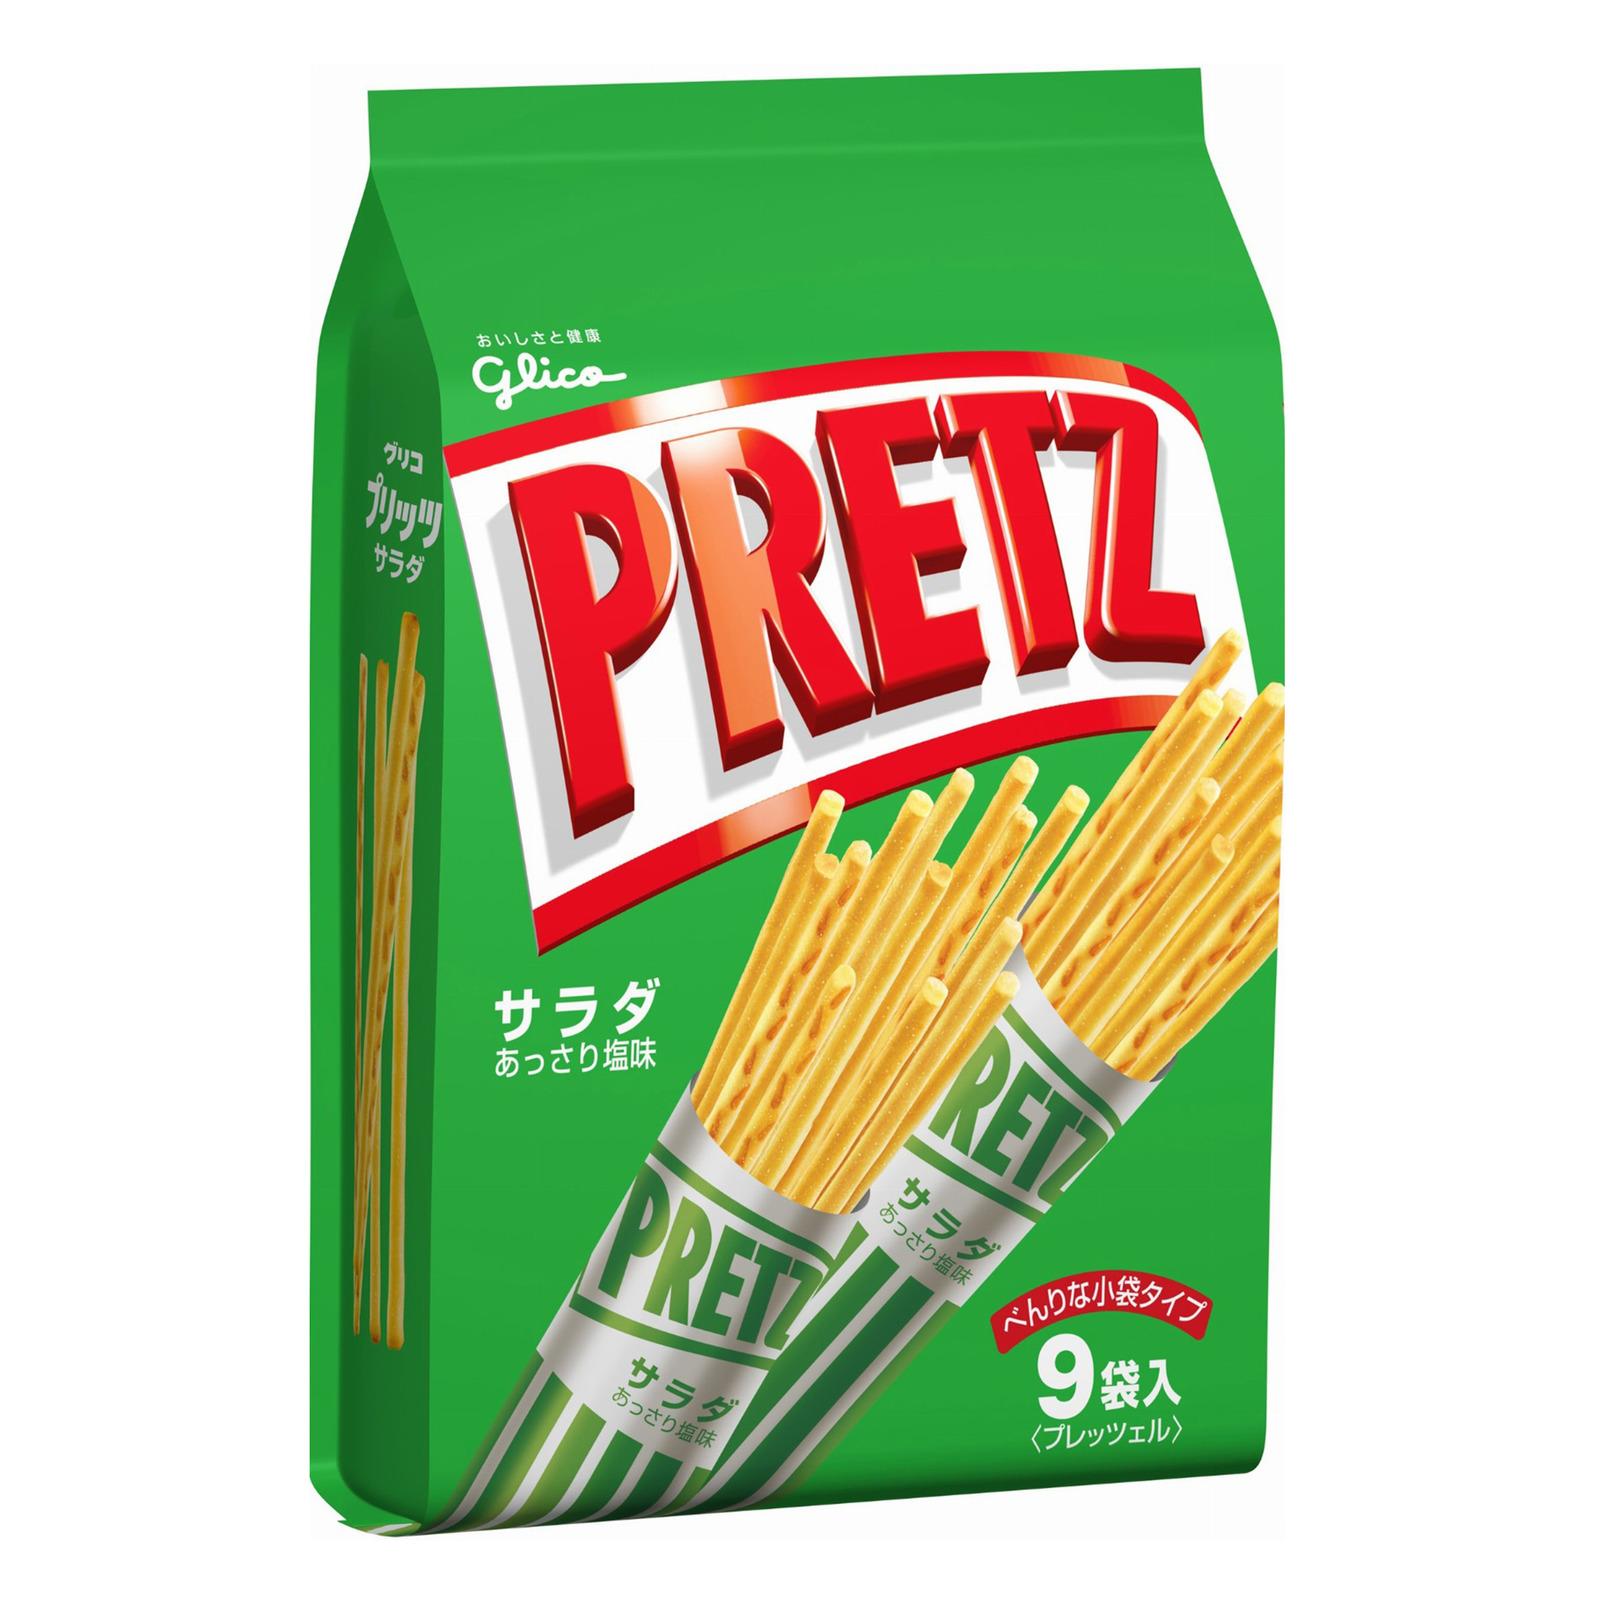 Glico Pocky - Pretz Salad